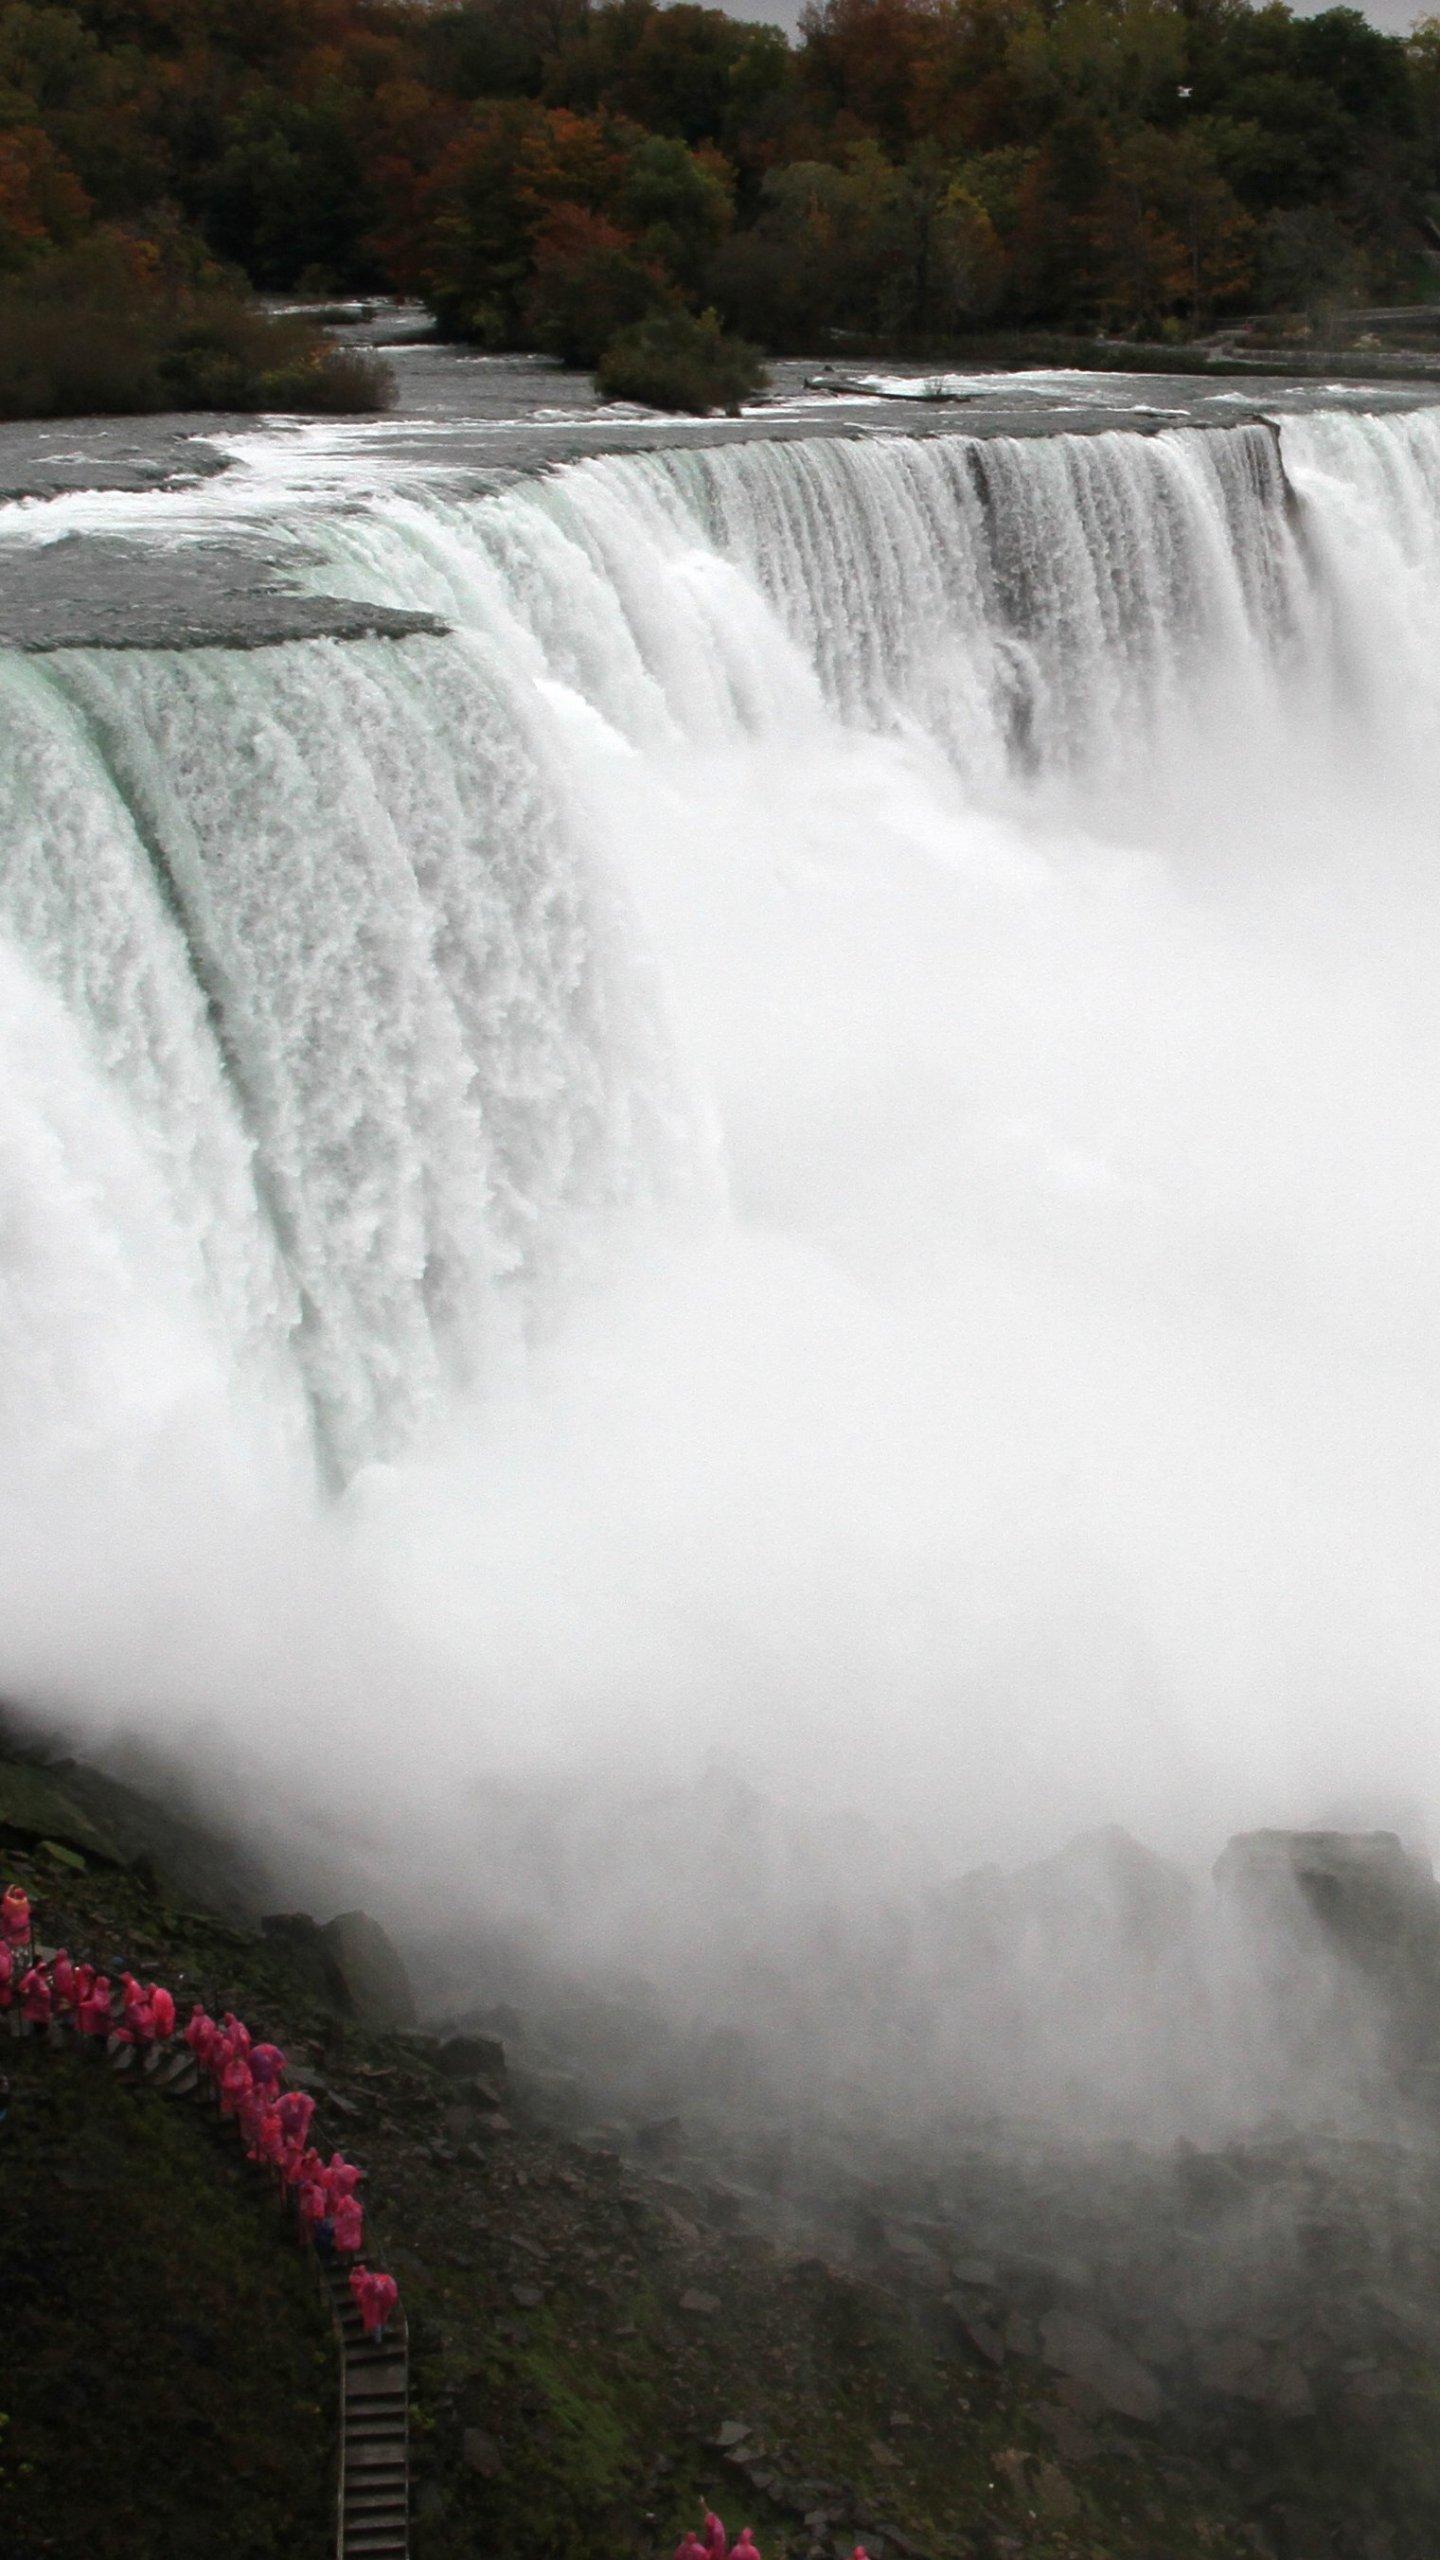 Niagara Falls Hd Wallpaper For Desktop Niagara Falls Wallpaper Mobile Amp Desktop Background